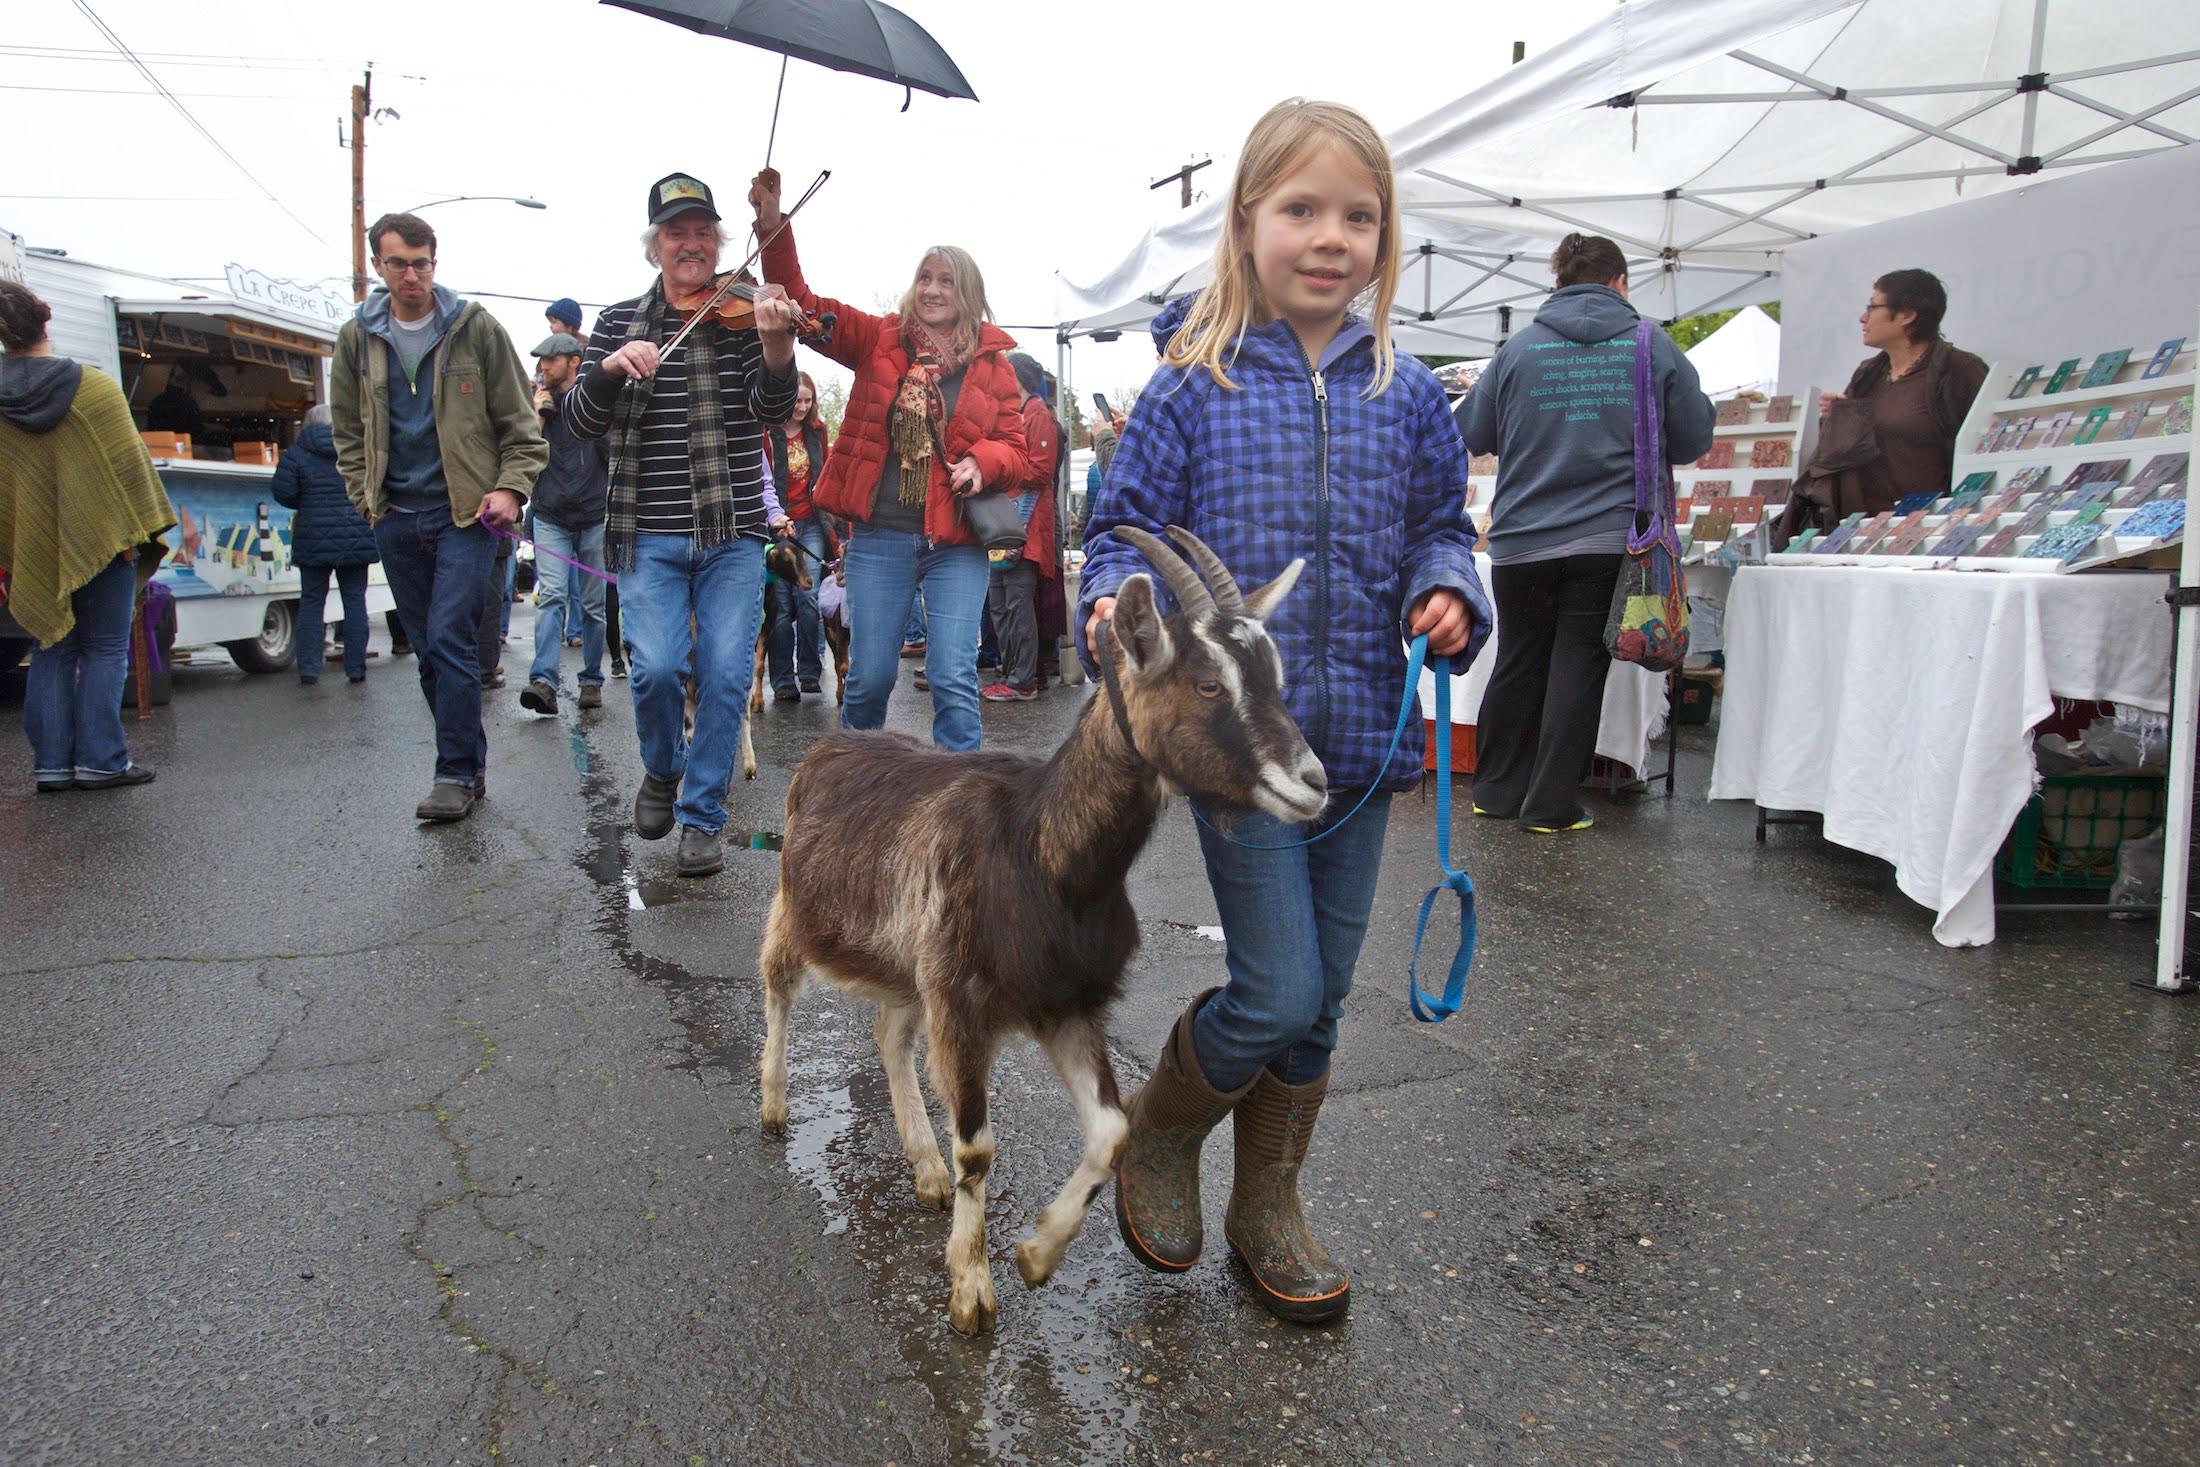 Goat parade photo by Steven Mullensky